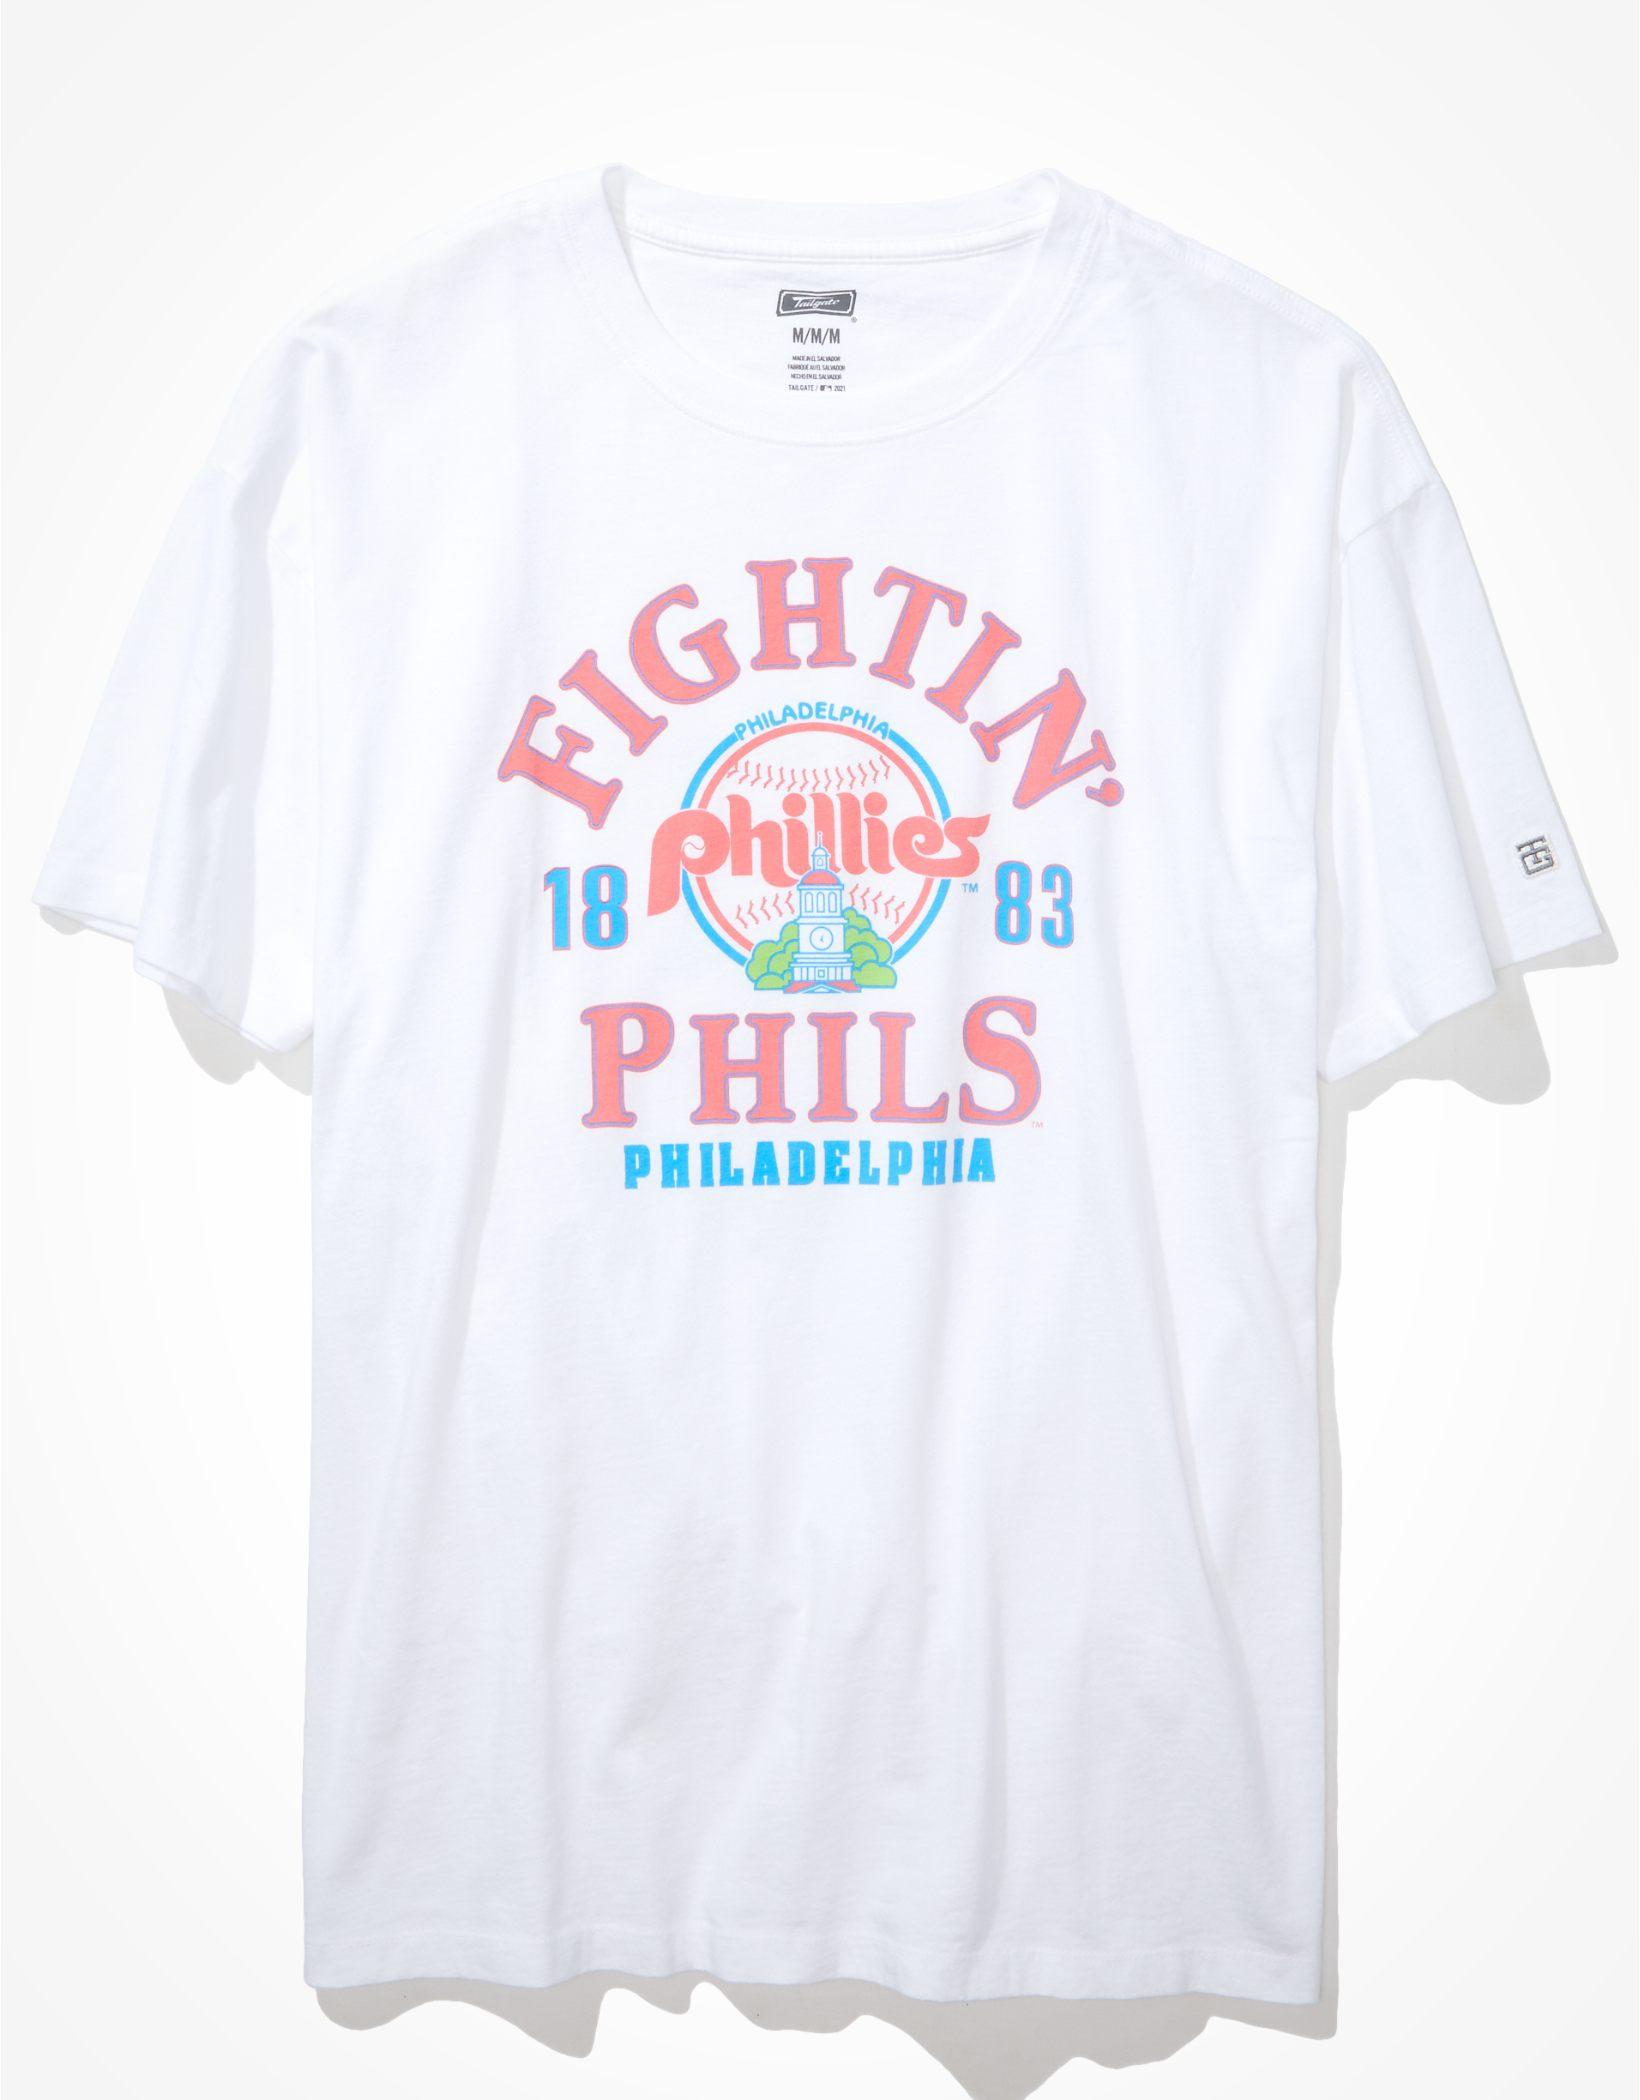 Tailgate Women's Philadelphia Phillies Oversized Graphic T-Shirt